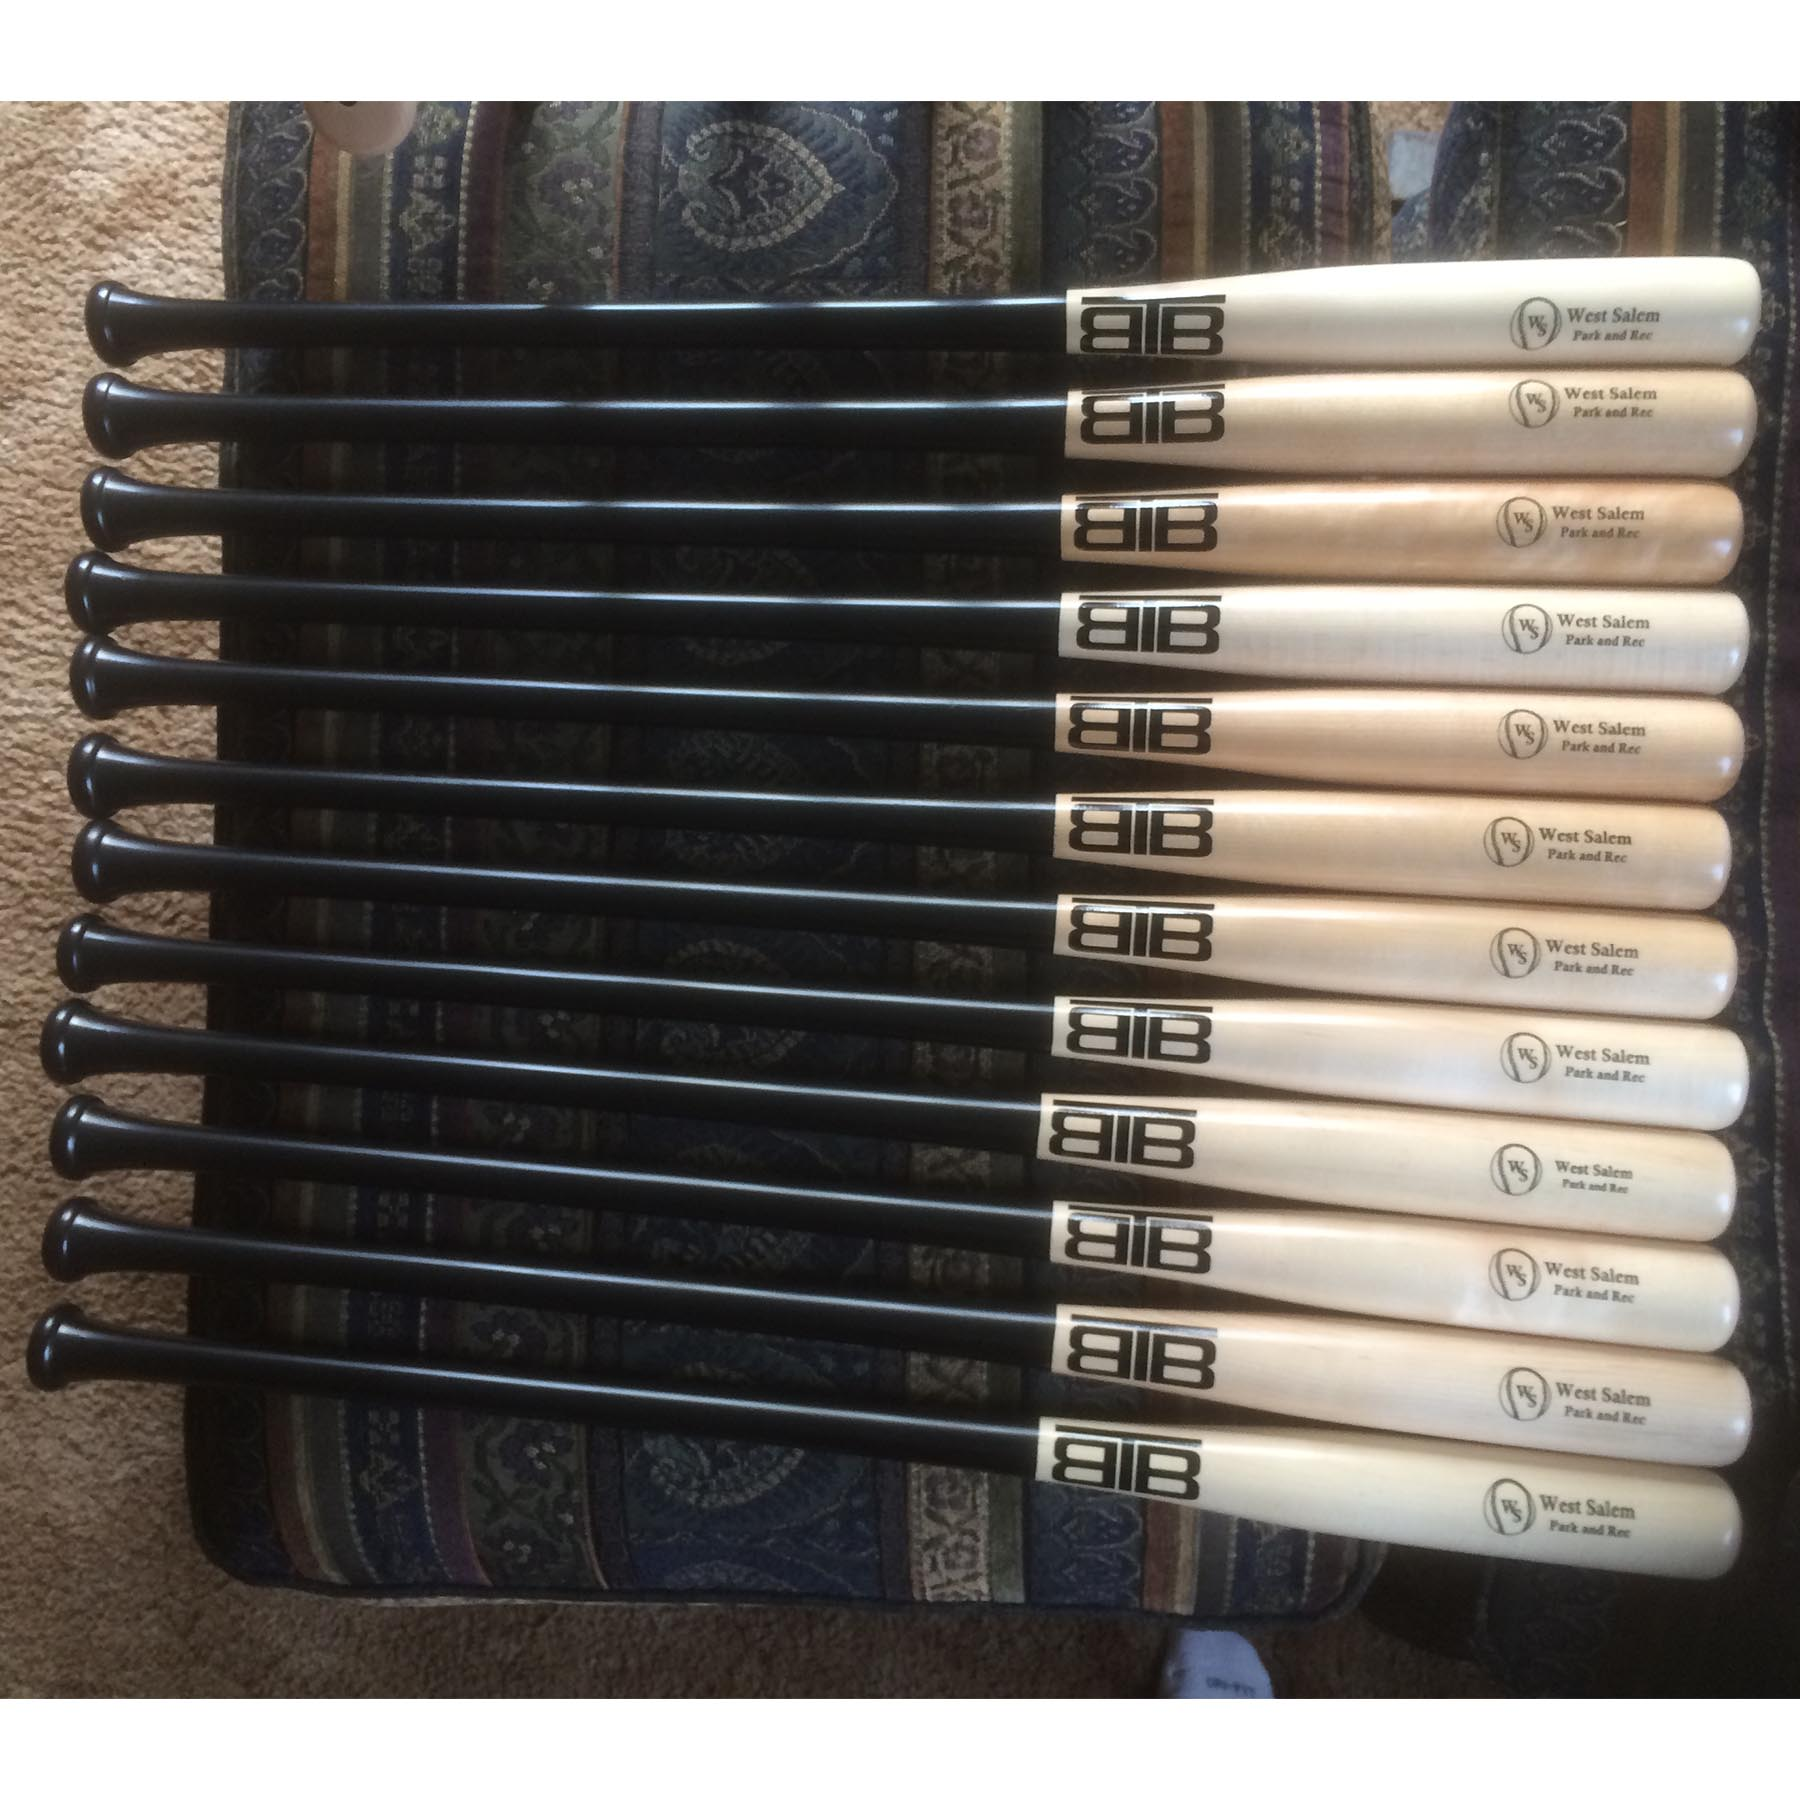 Full Sized Wood Trophy Award Bat Three Brothers Bats